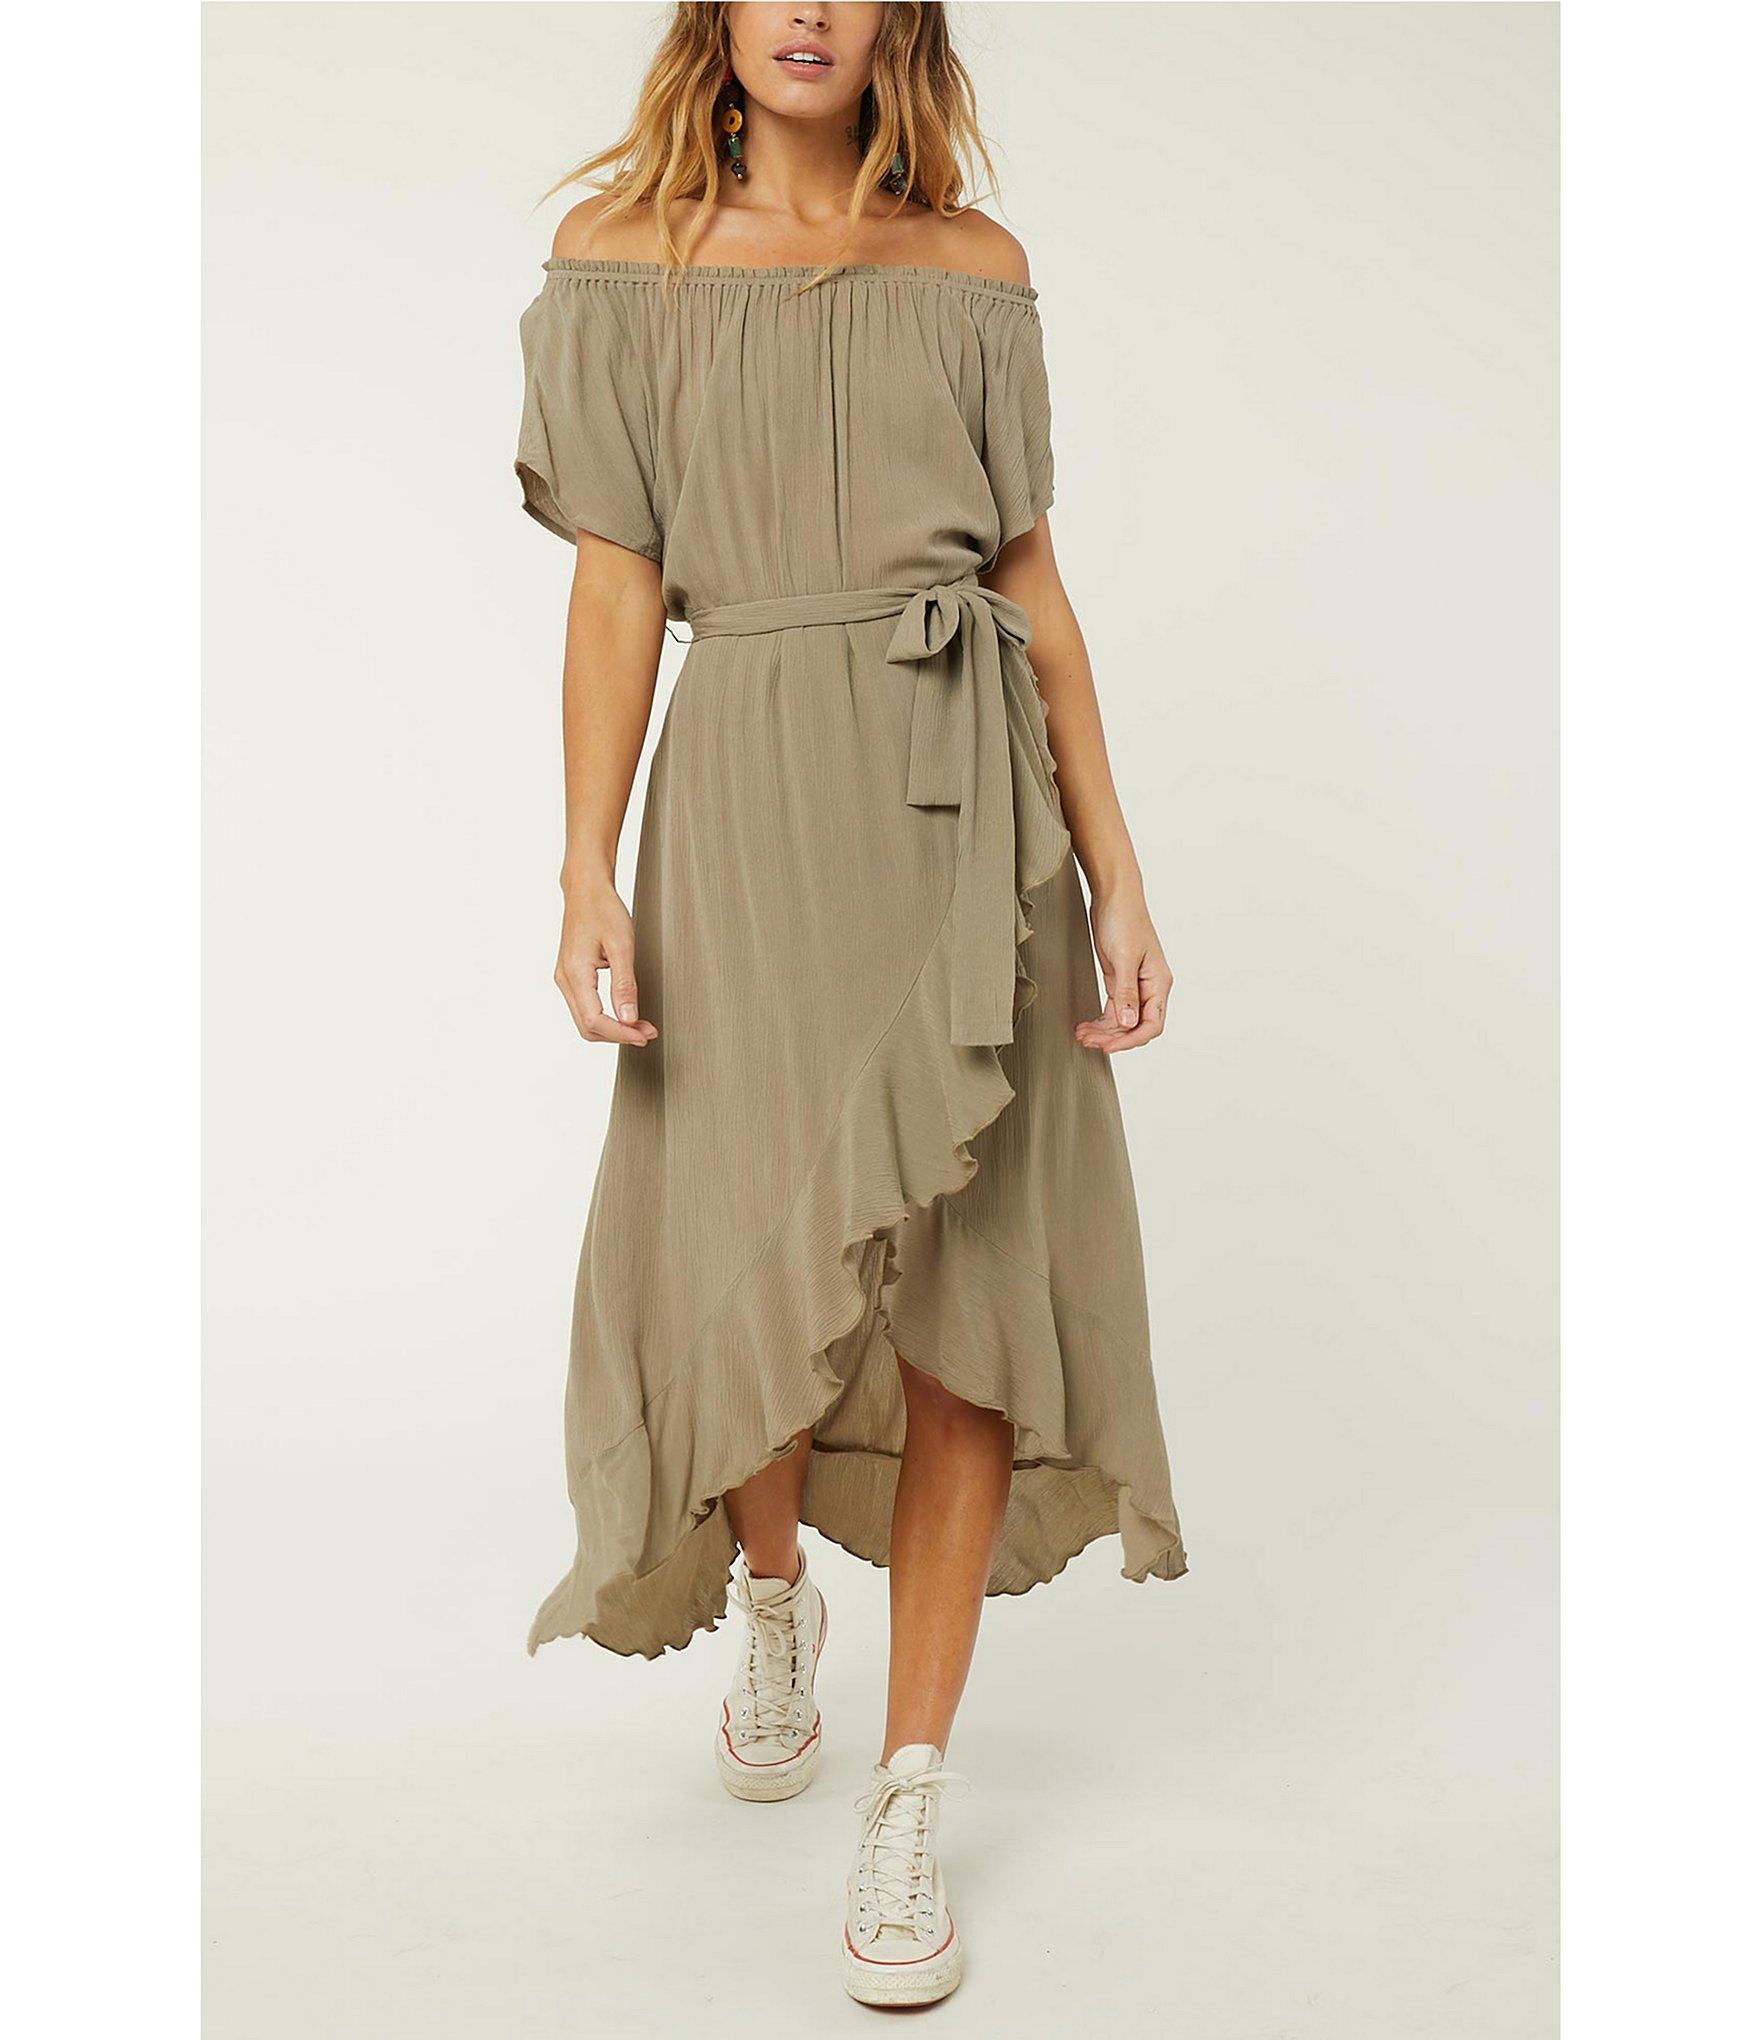 4d420cac4f038 O'neill Sportswear. Women's Green Connie Off The Shoulder Midi Wrap Dress